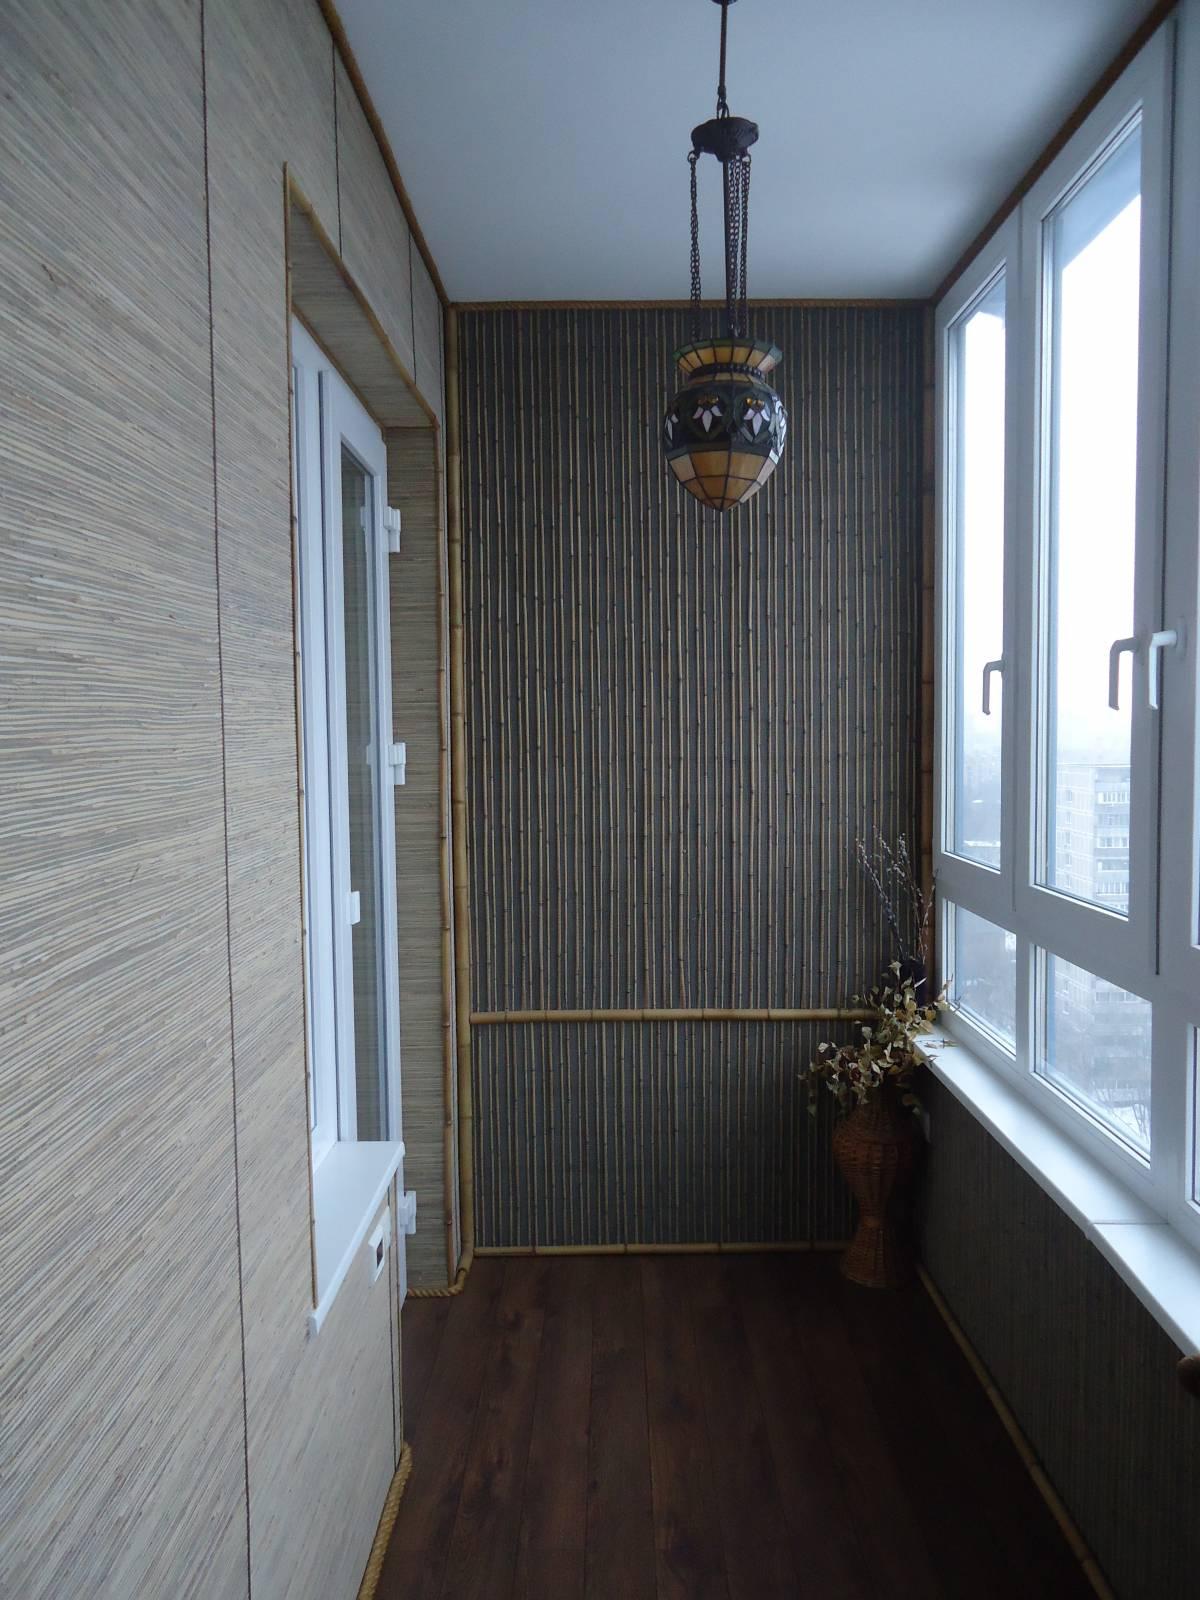 Интерьер балкона бамбуком - дизайнерини.